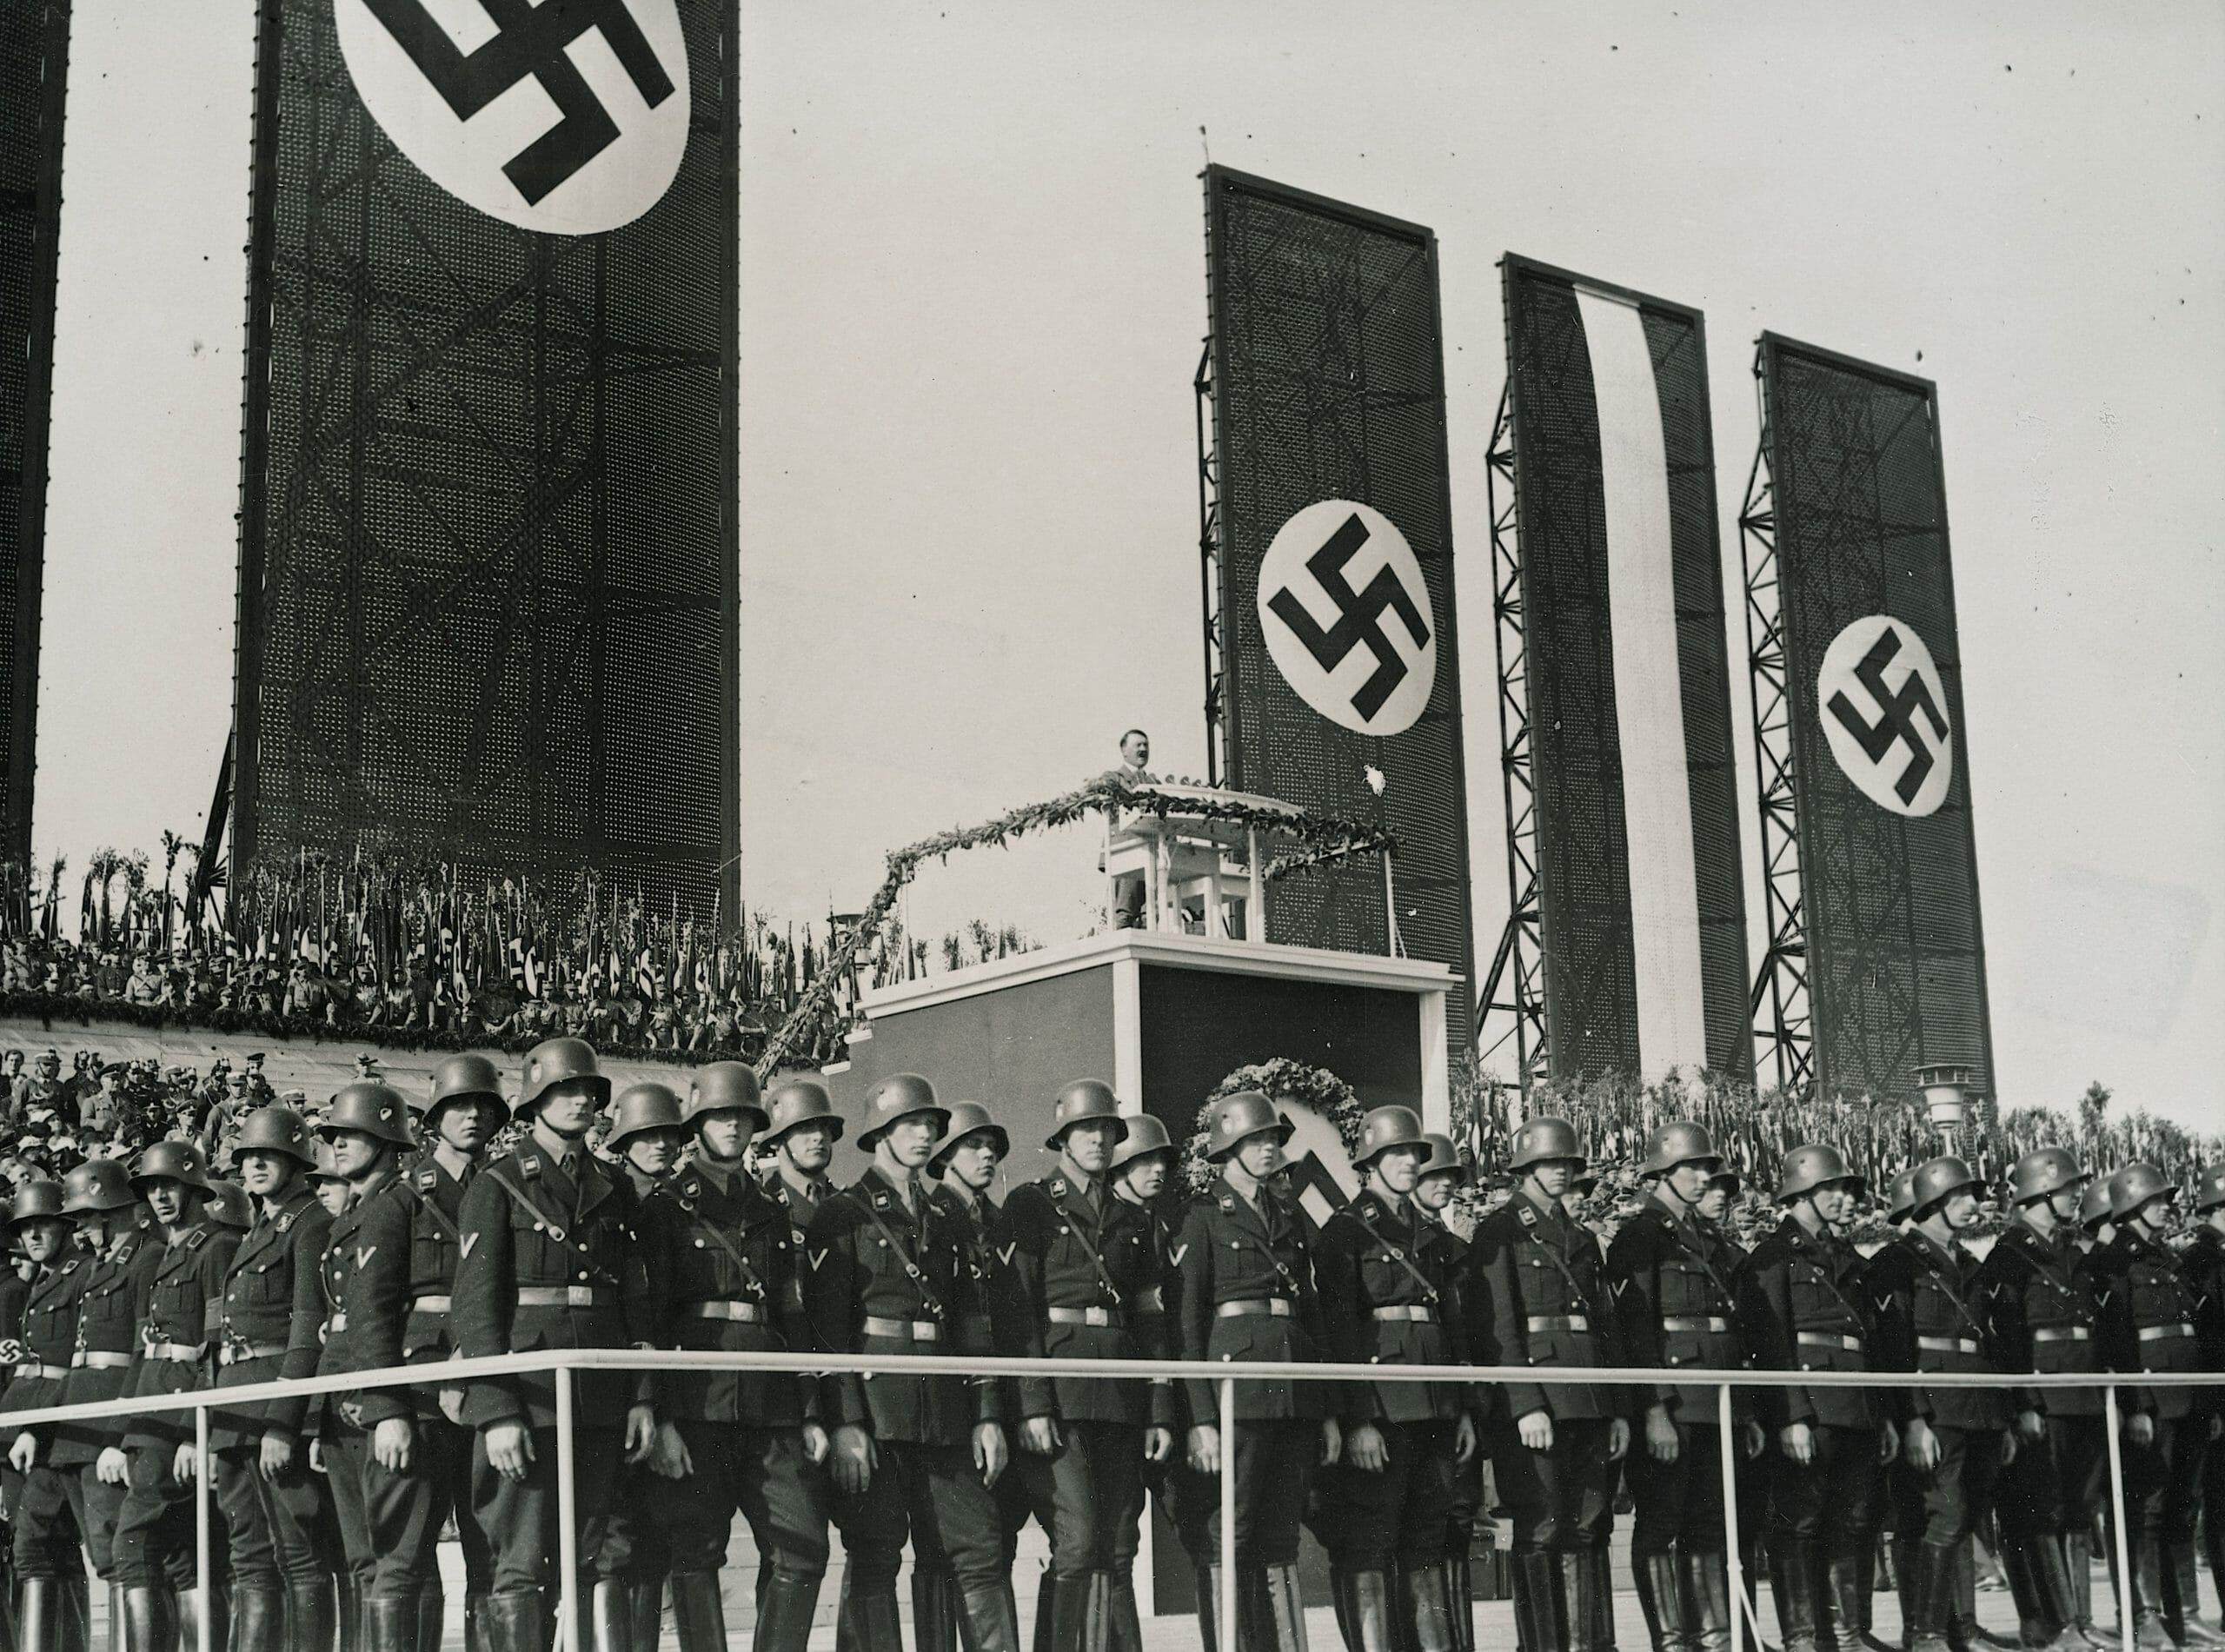 FAKTA: Kort om Nazismen